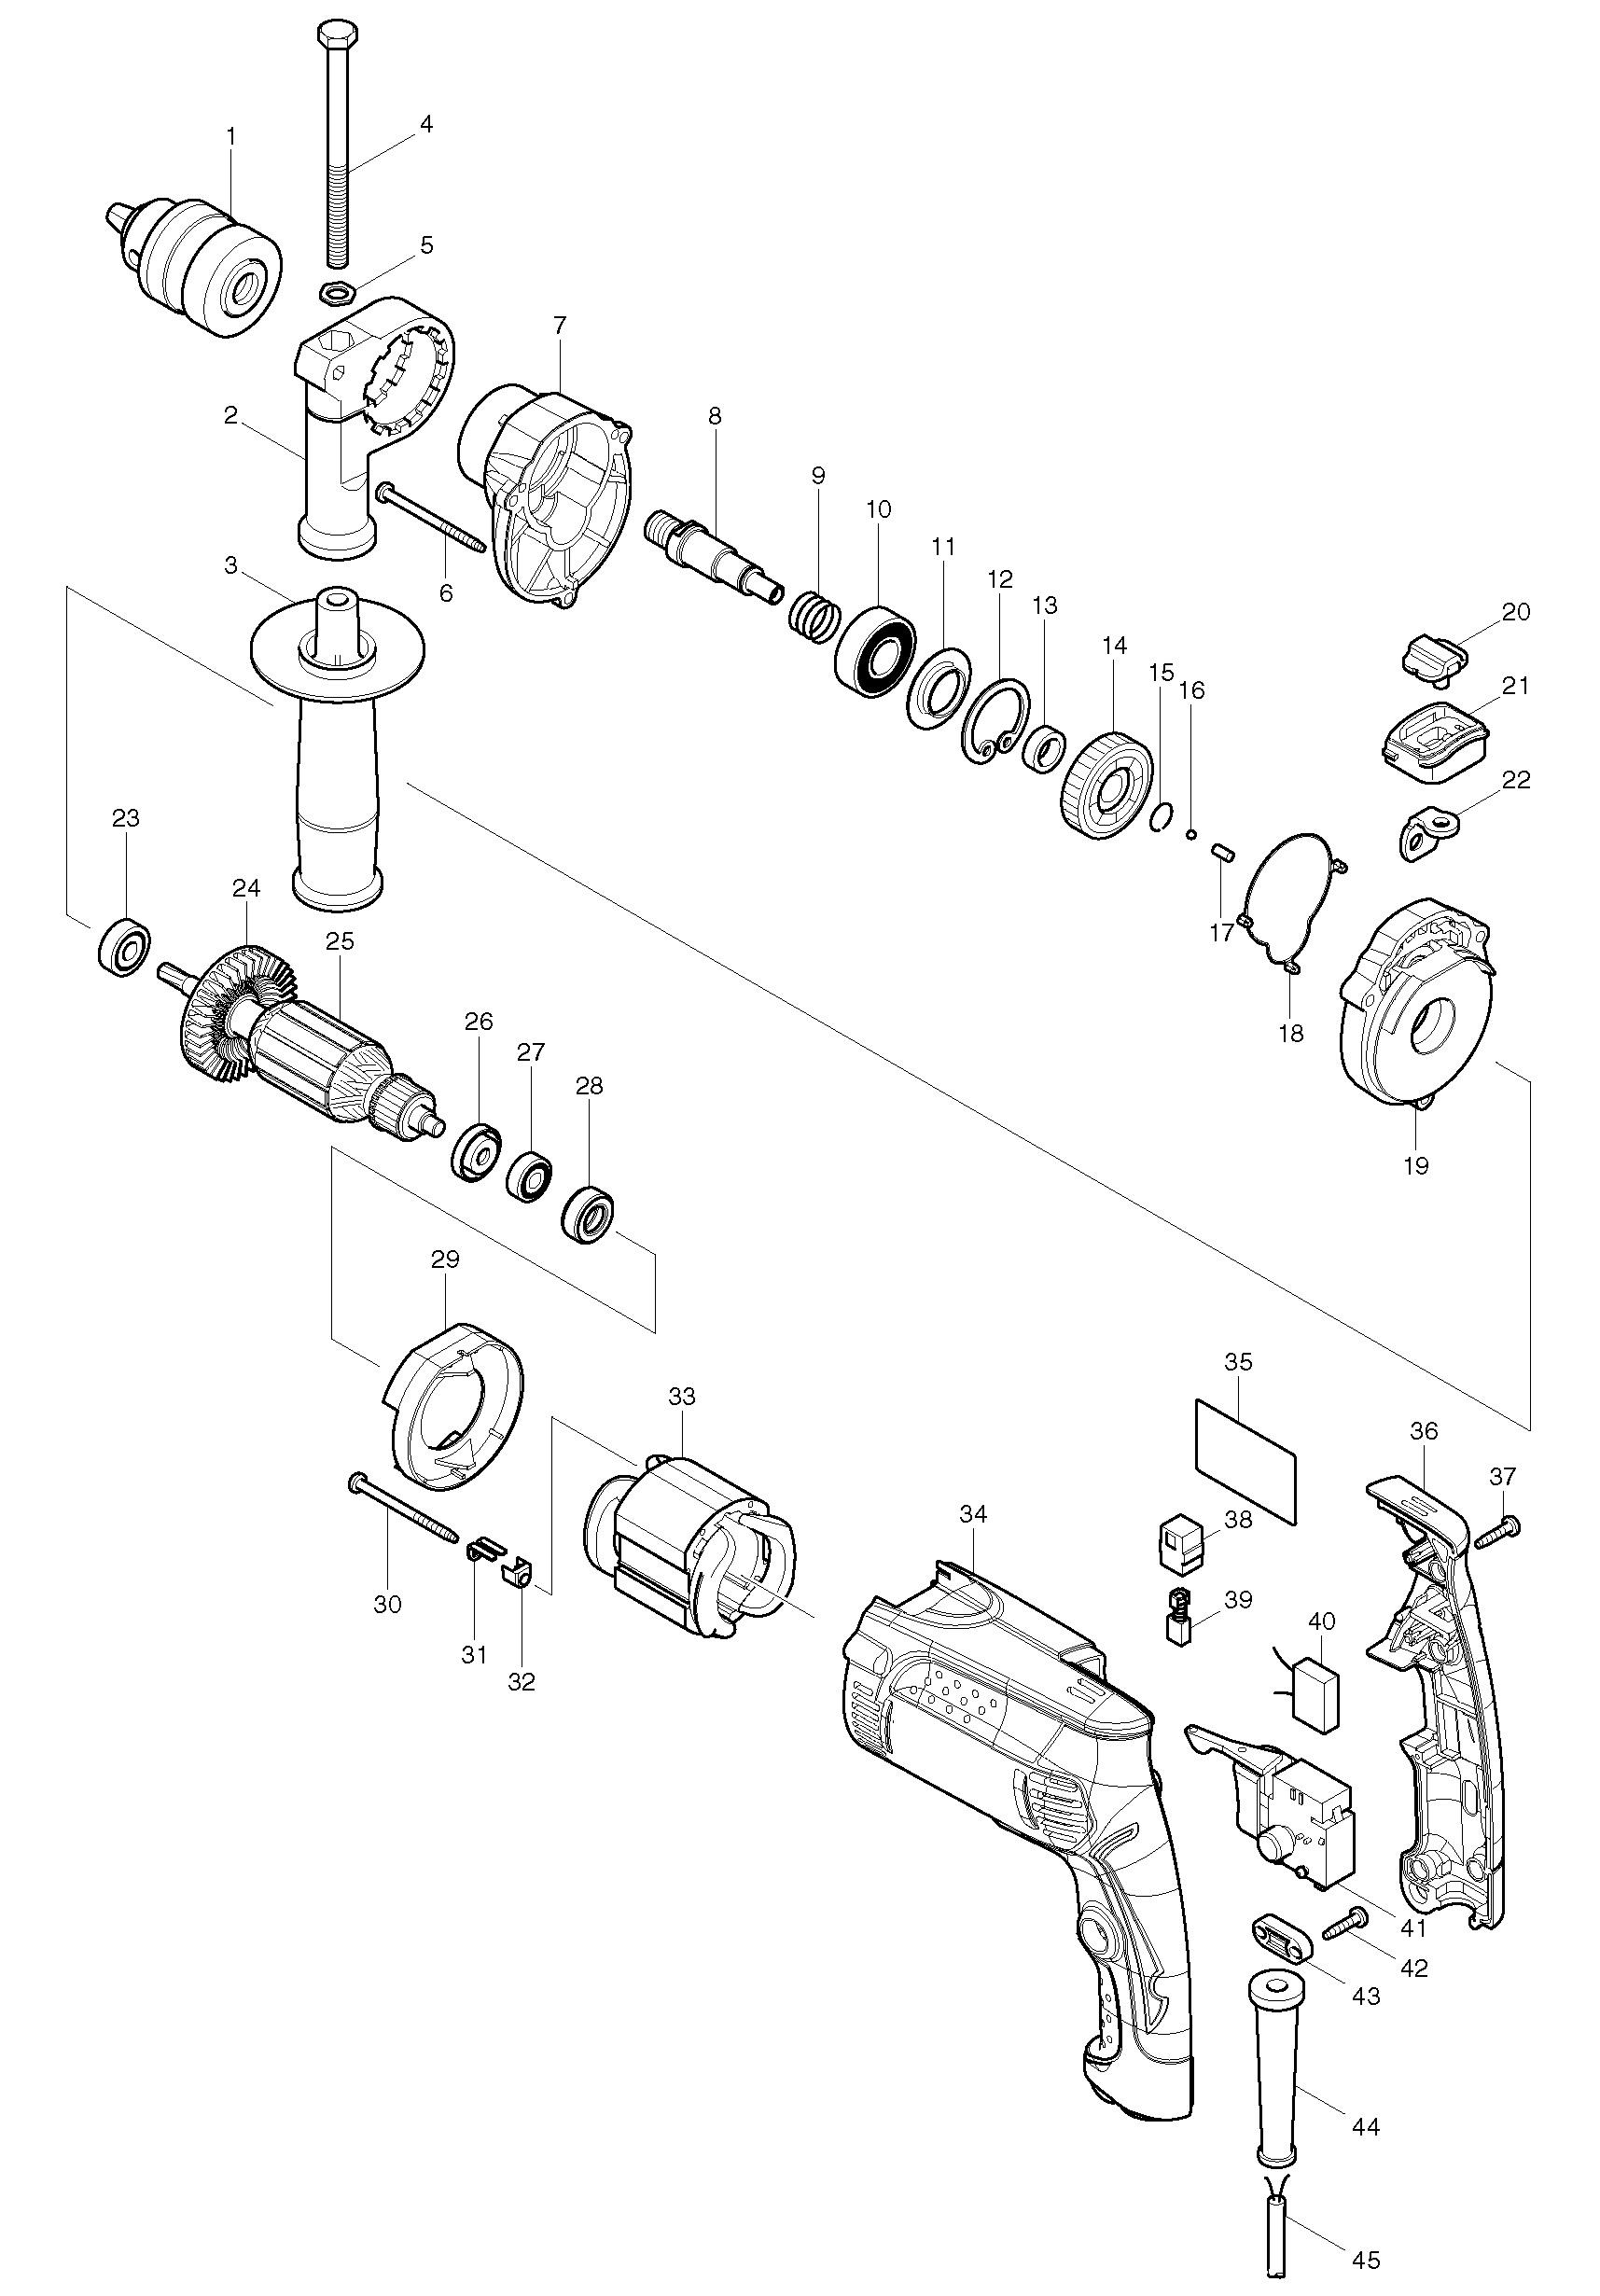 Деталировка на ударную дрель WATT WSM-800 (2.800.013.00)